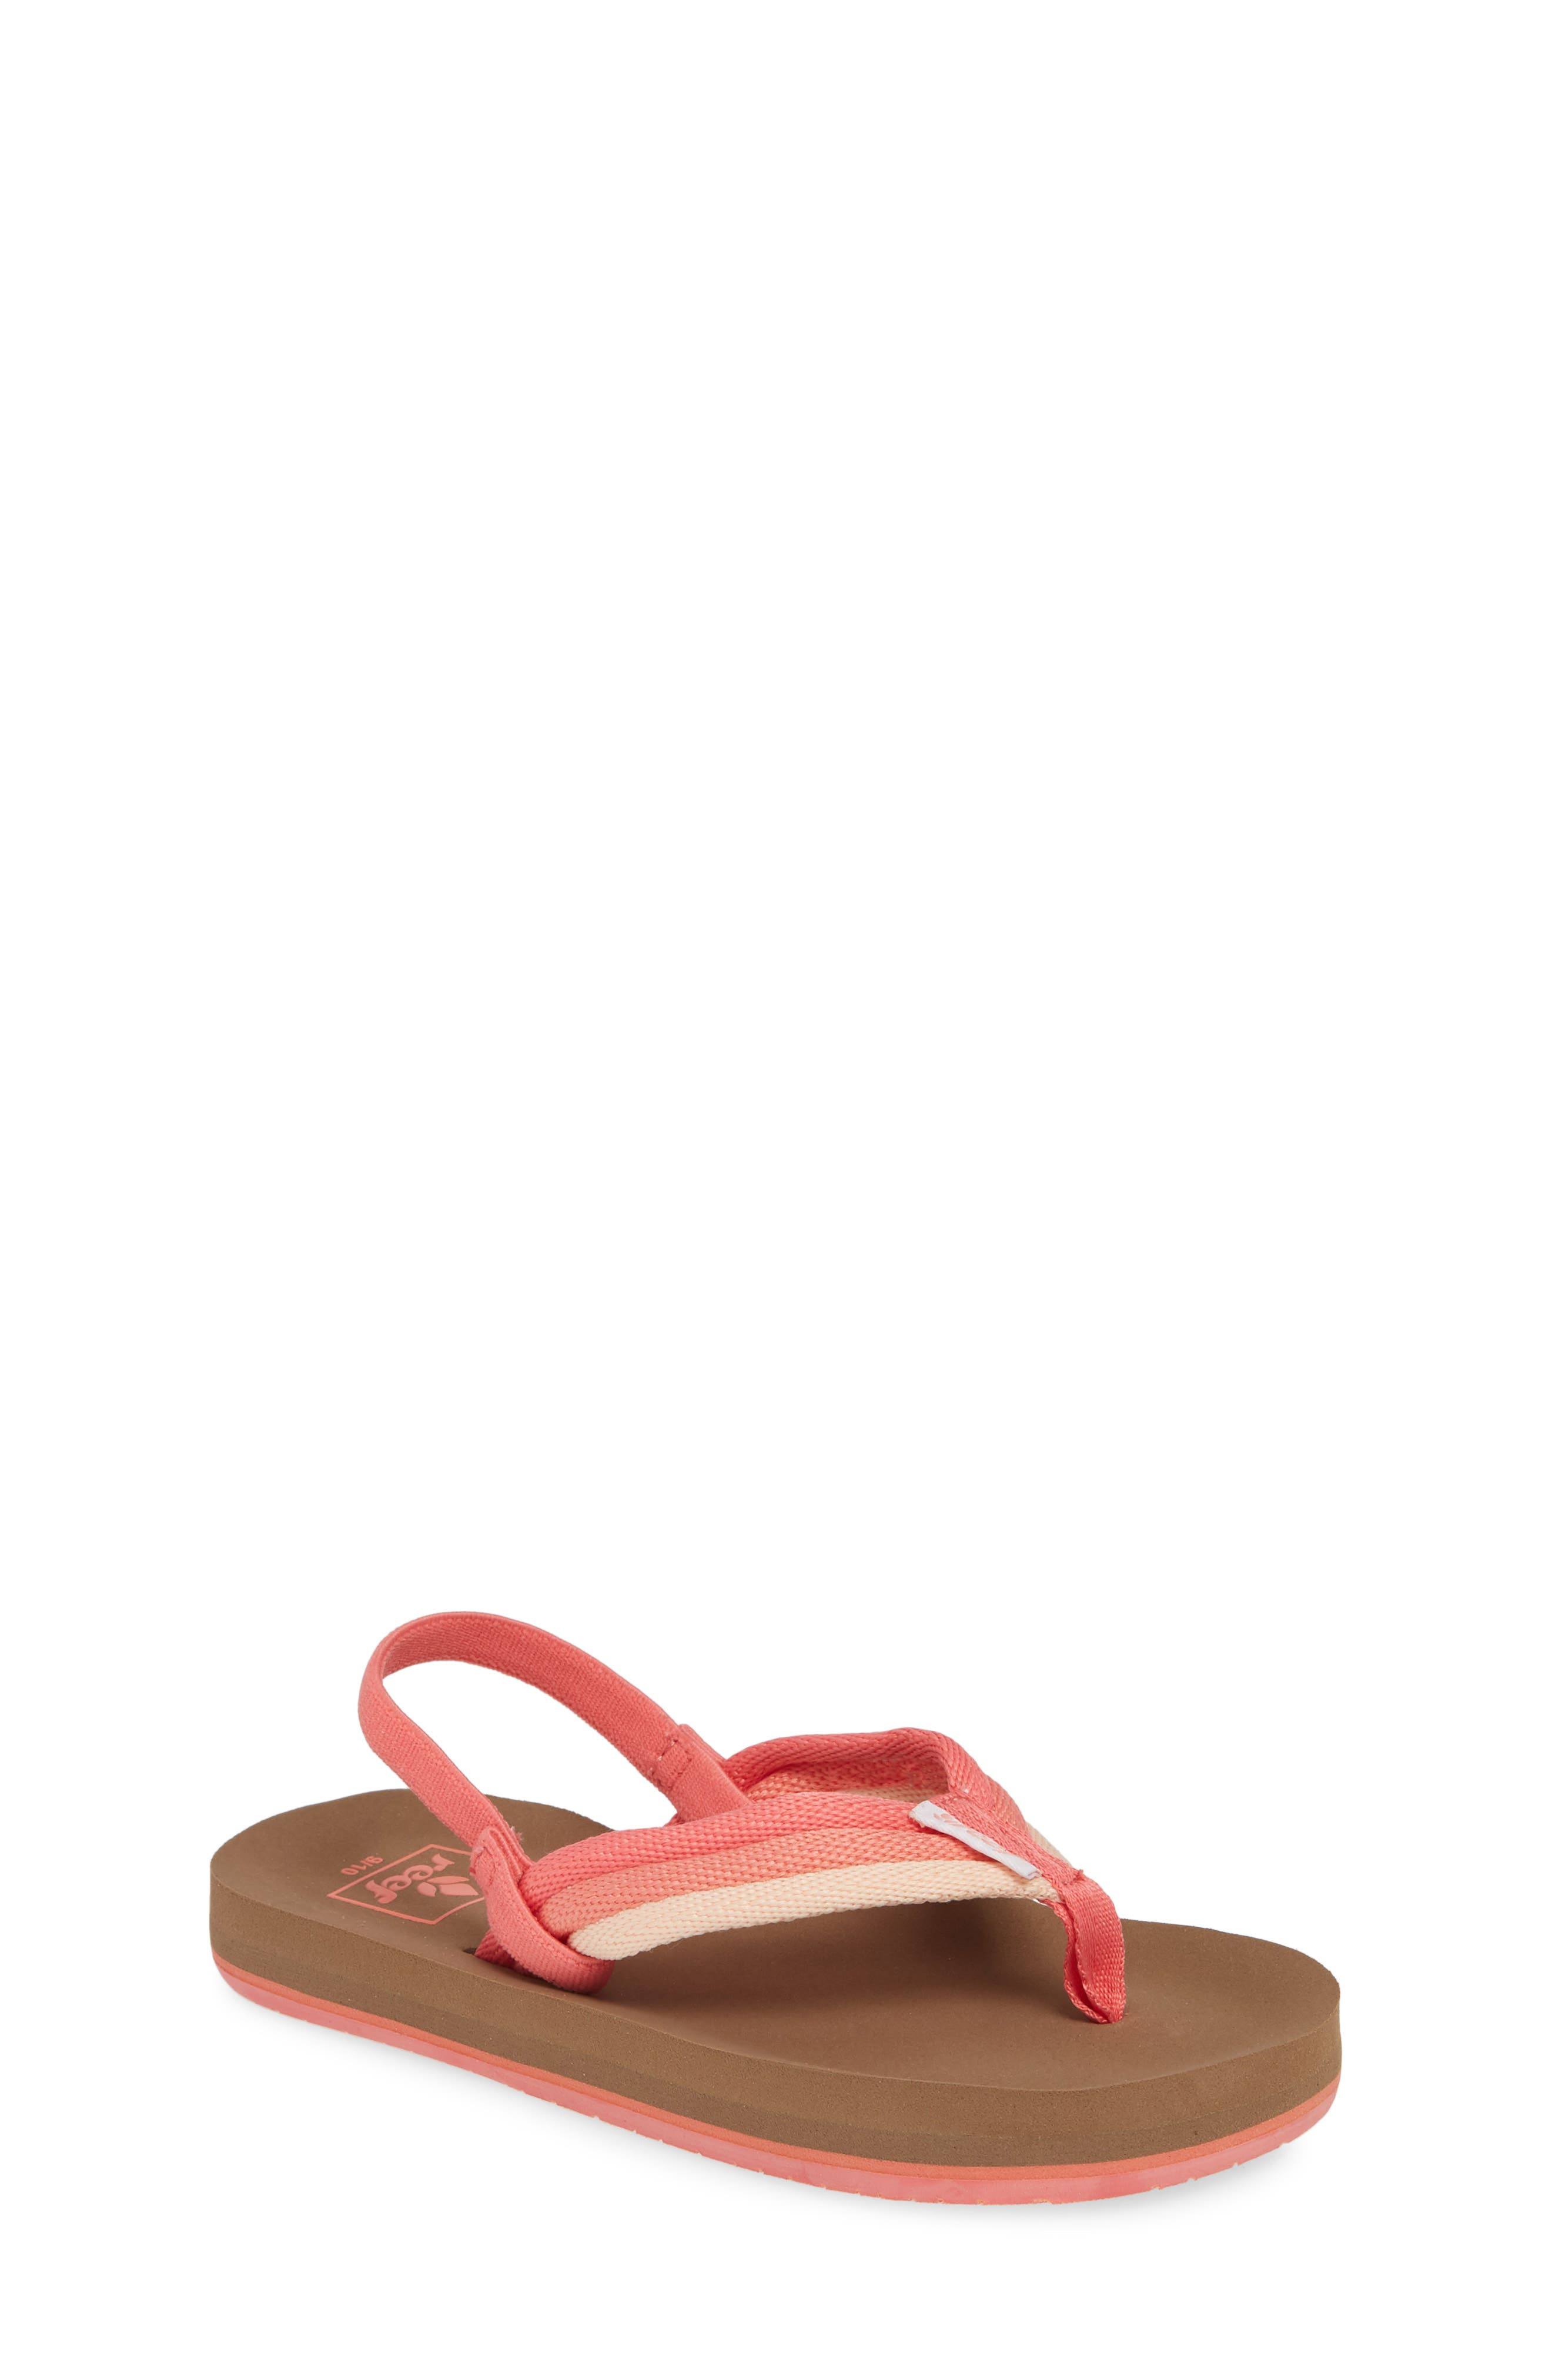 REEF, Little Ahi Beach Thong Sandal, Main thumbnail 1, color, RASPBERRY